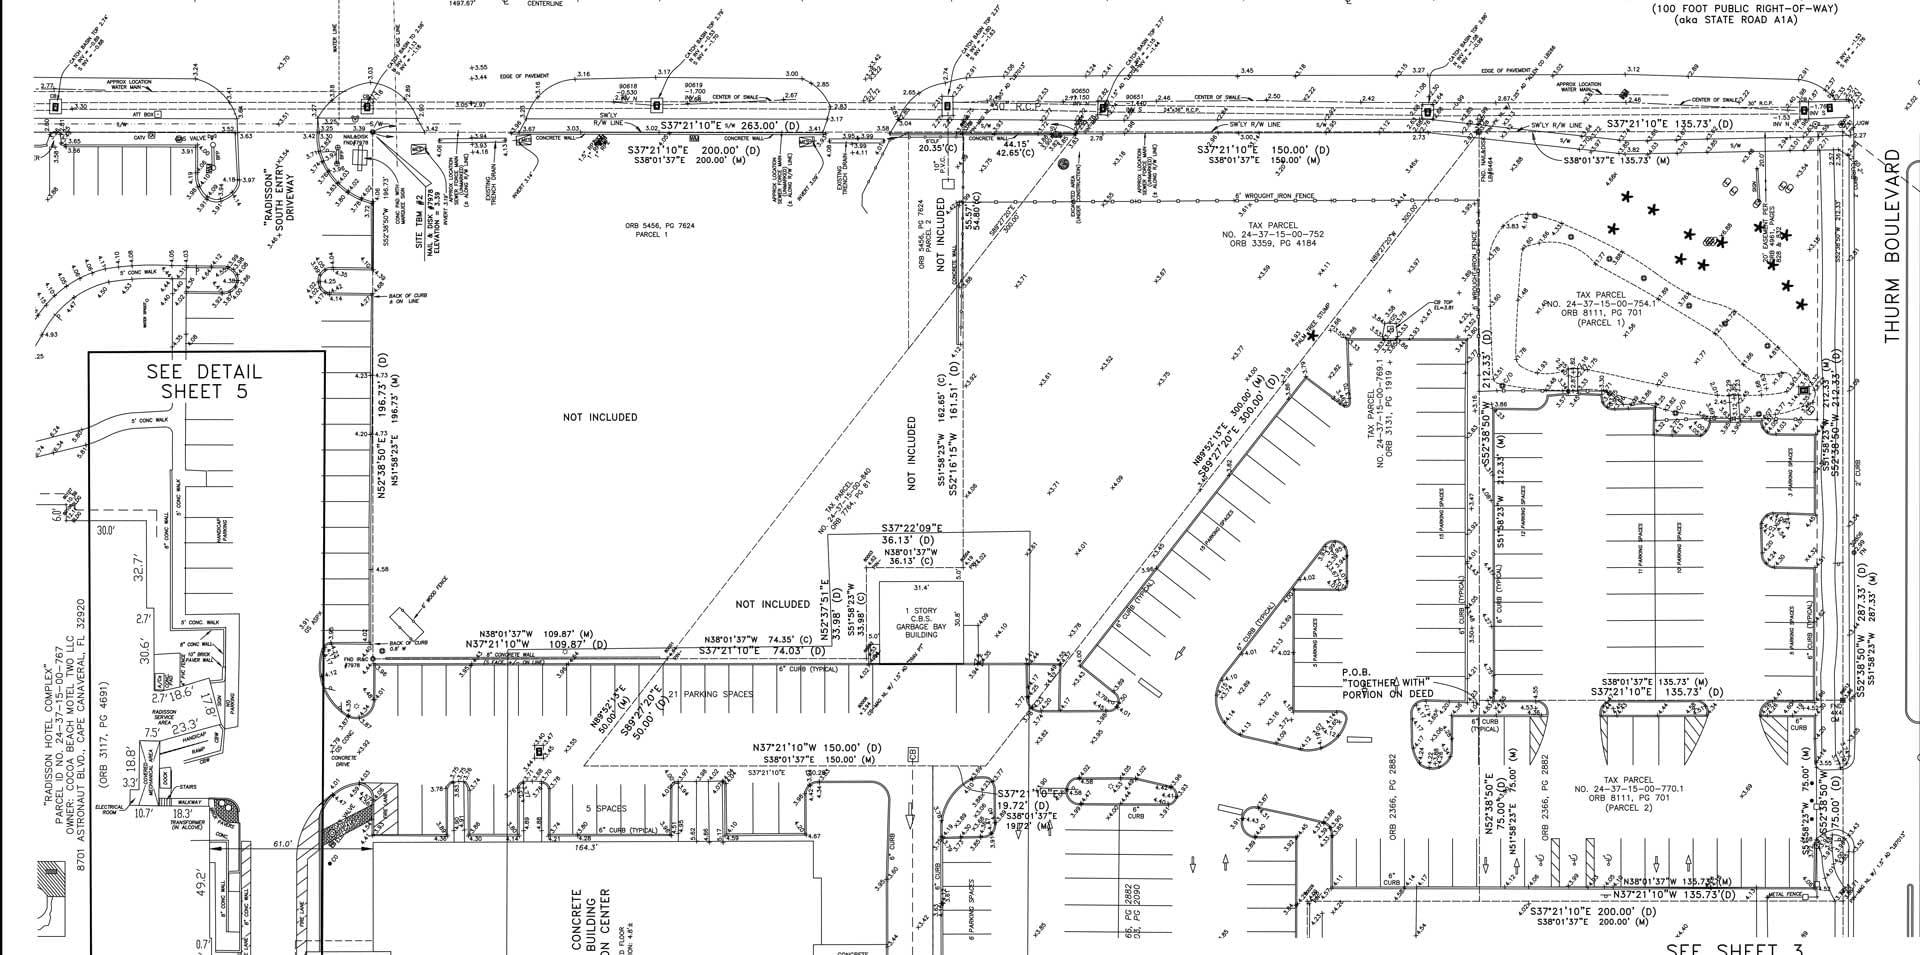 Raddison full lot layout